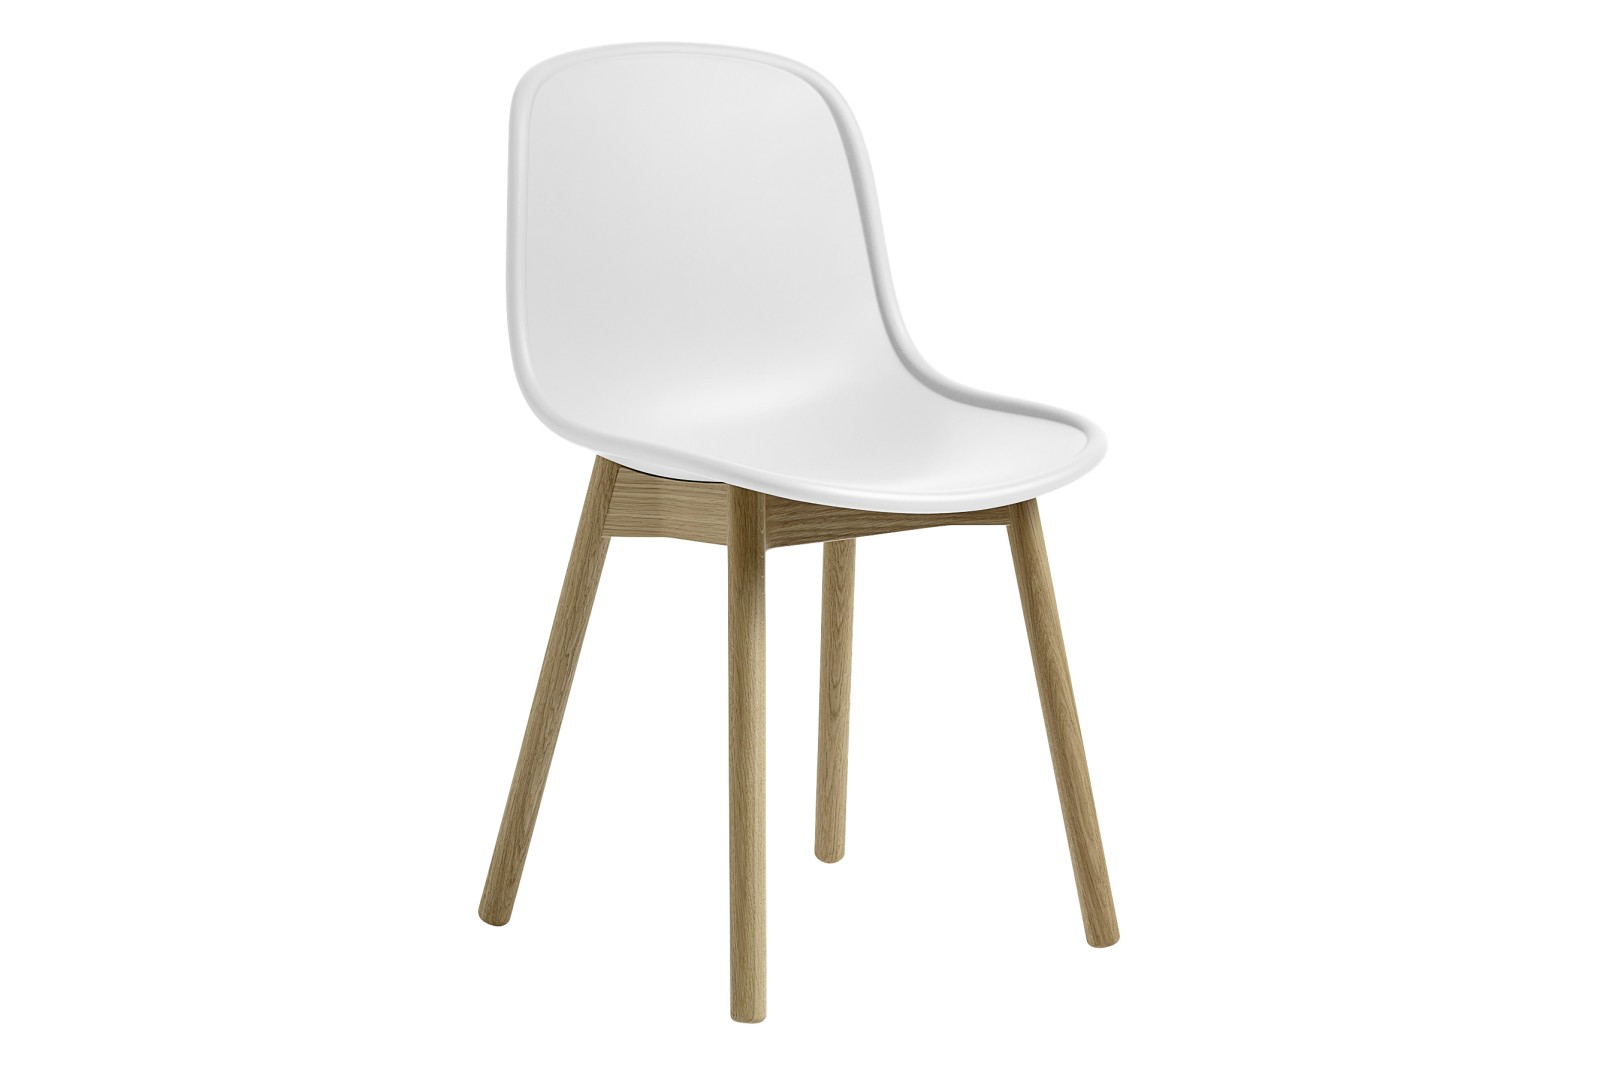 Neu 13 Dining Chair Plastic Cream White, Wood Matt Oak